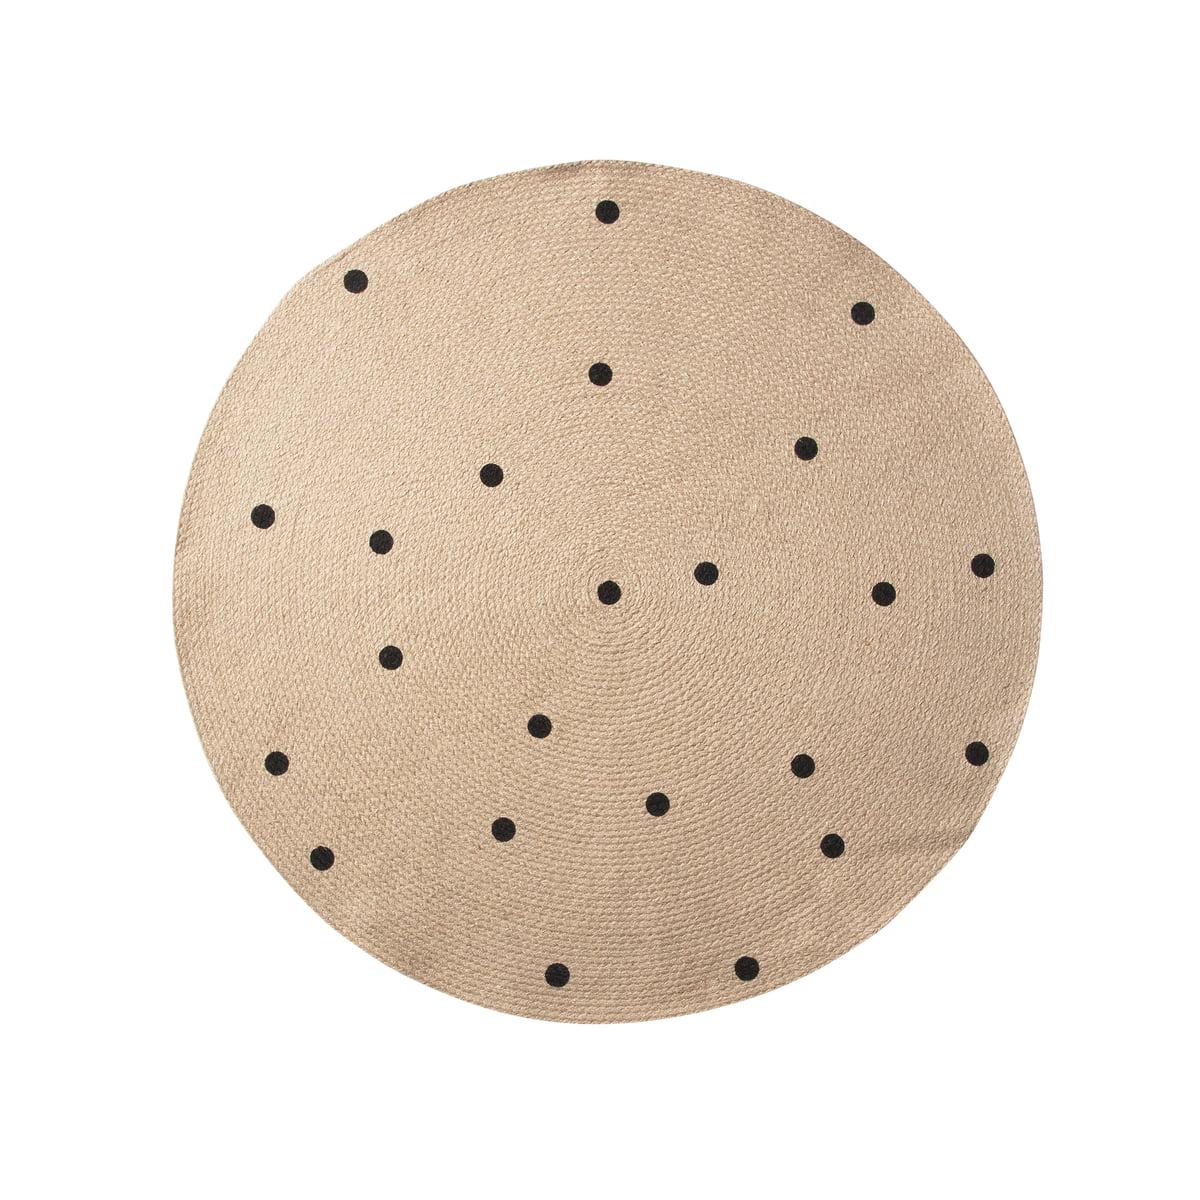 Black Dots Jute Carpet Von Ferm Living Kaufen